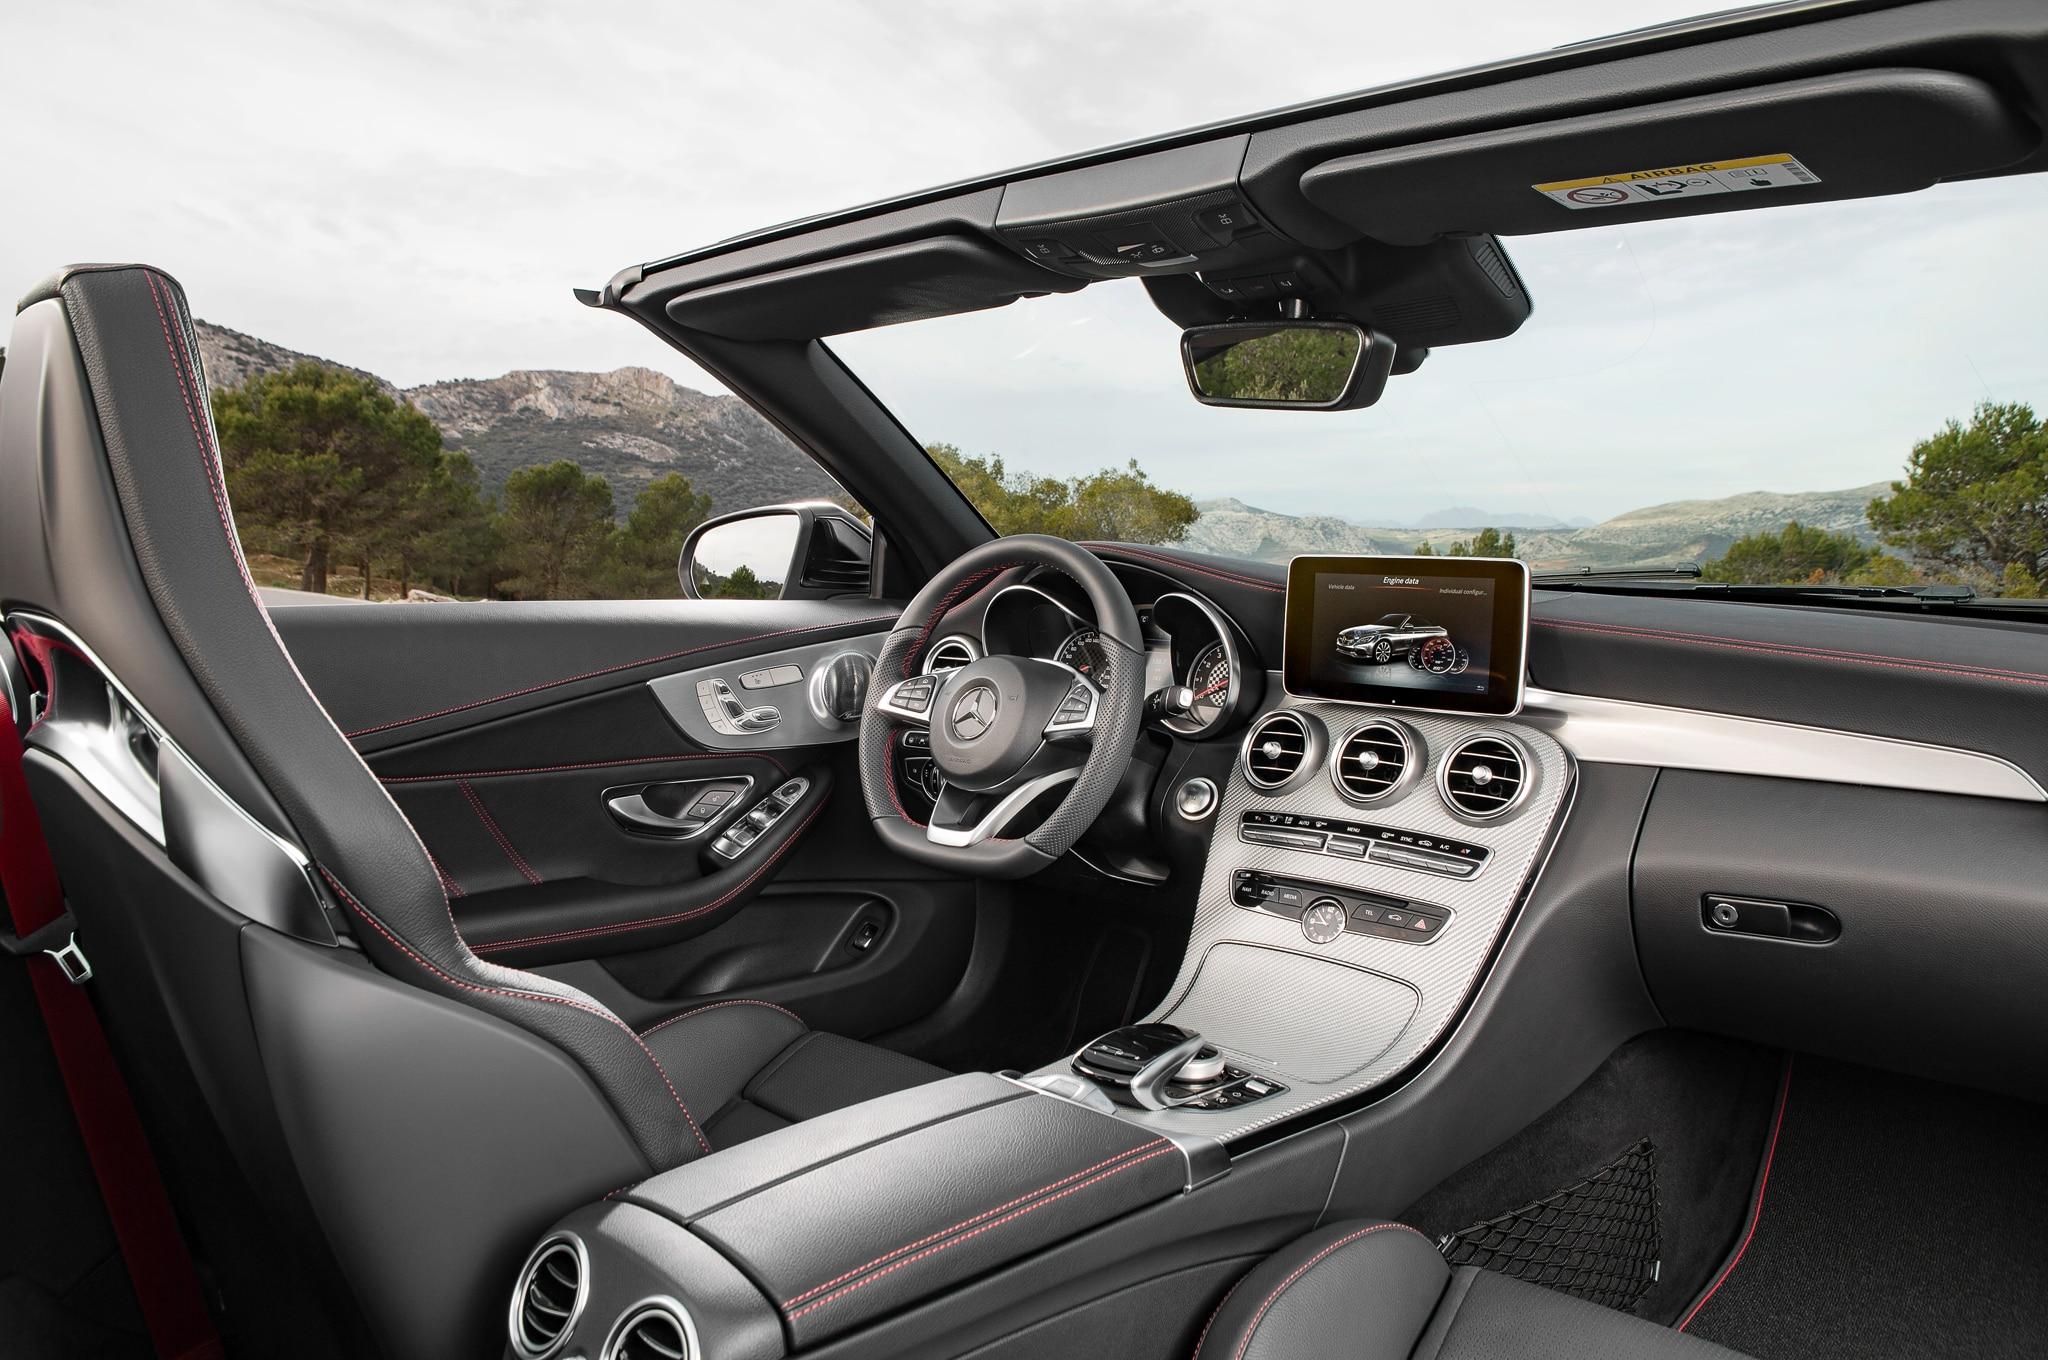 http://st.automobilemag.com/uploads/sites/11/2016/02/2017-Mercedes-AMG-C43-Cabriolet-interior.jpg